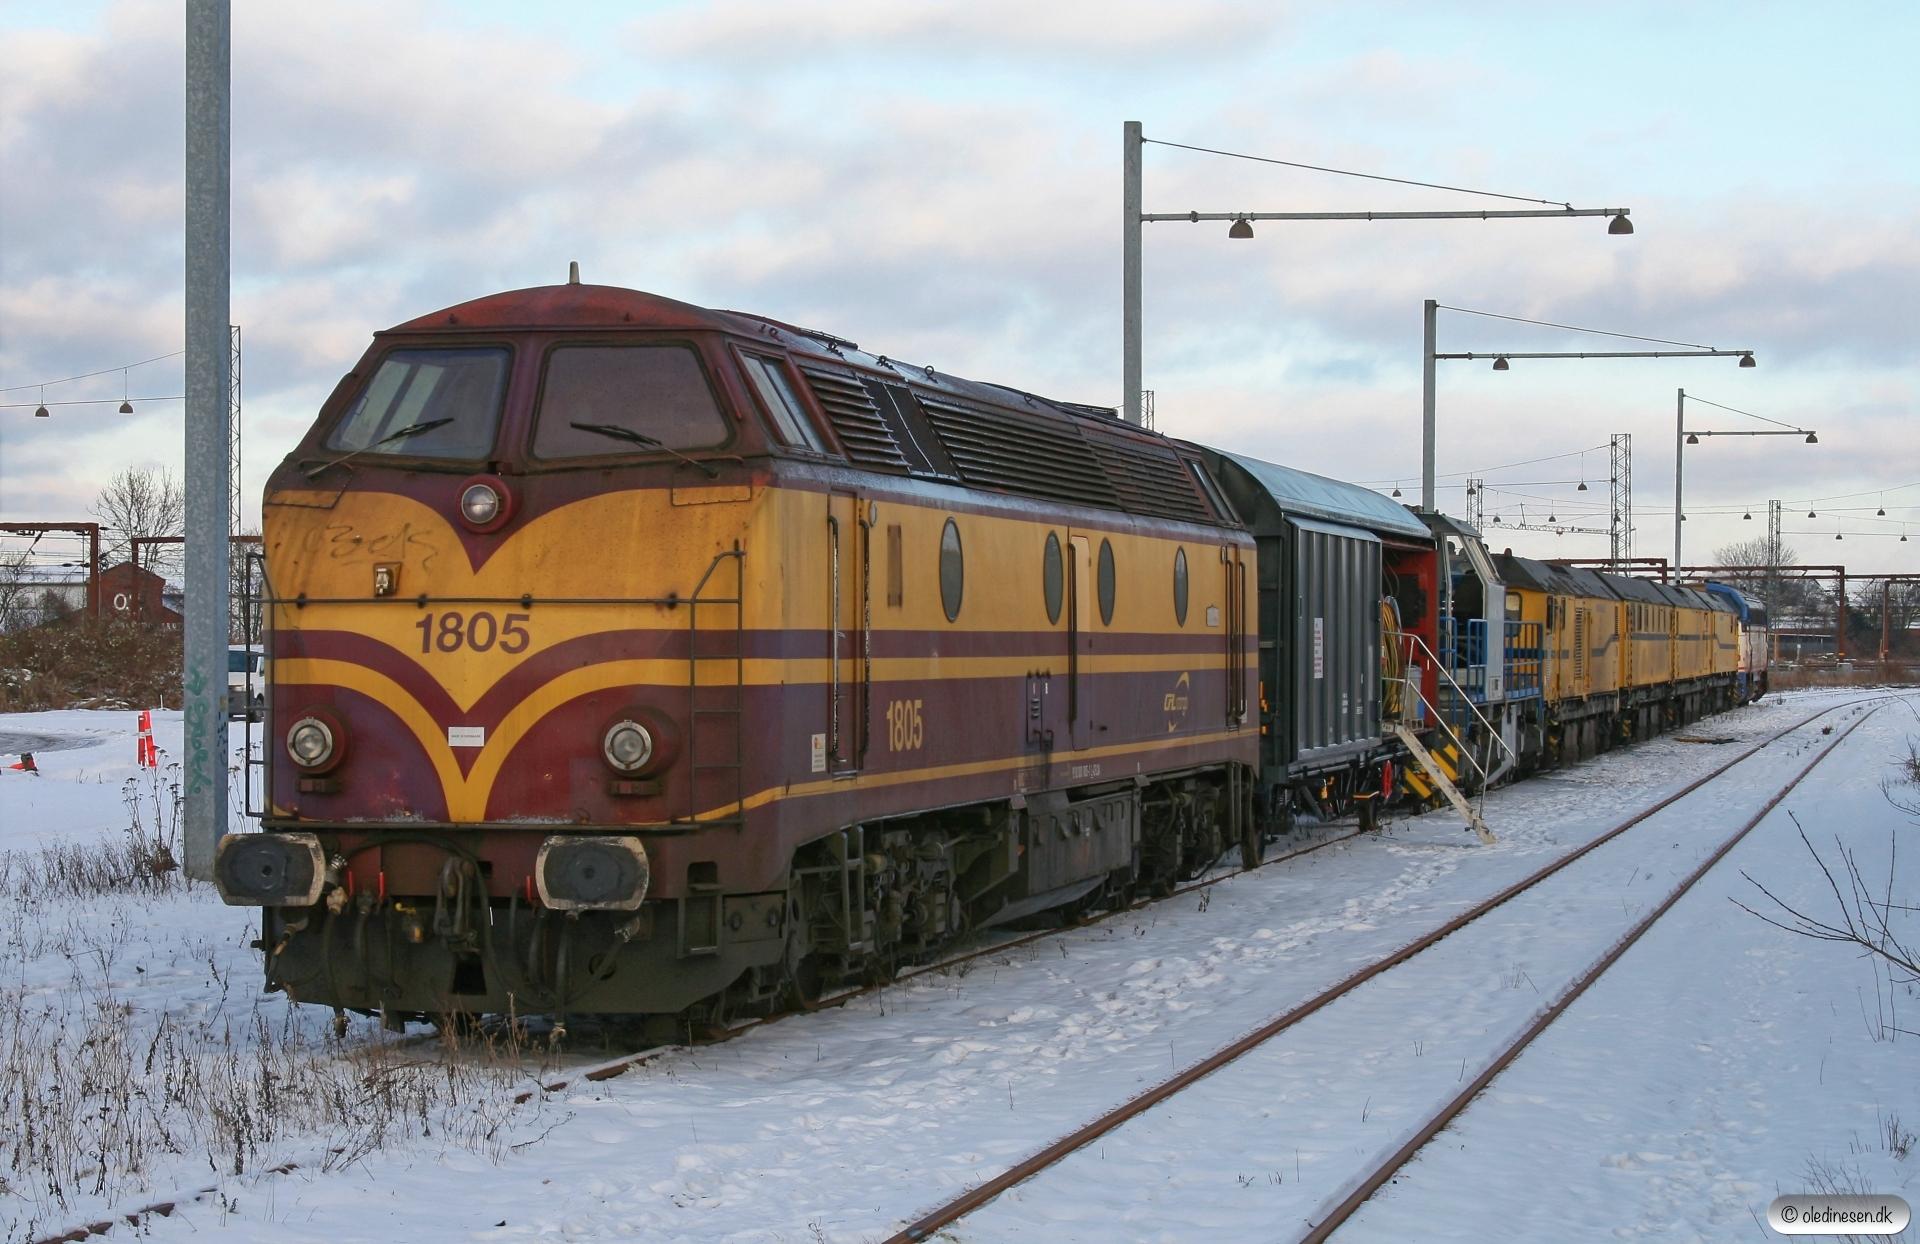 CFLCA 1805+EEWSS Hbillns 23 56 2275 106-5+CFLCA 92 82 000 1104-9+Speno slibetog+CFLCD MY 1146. Odense 20.01.2013.